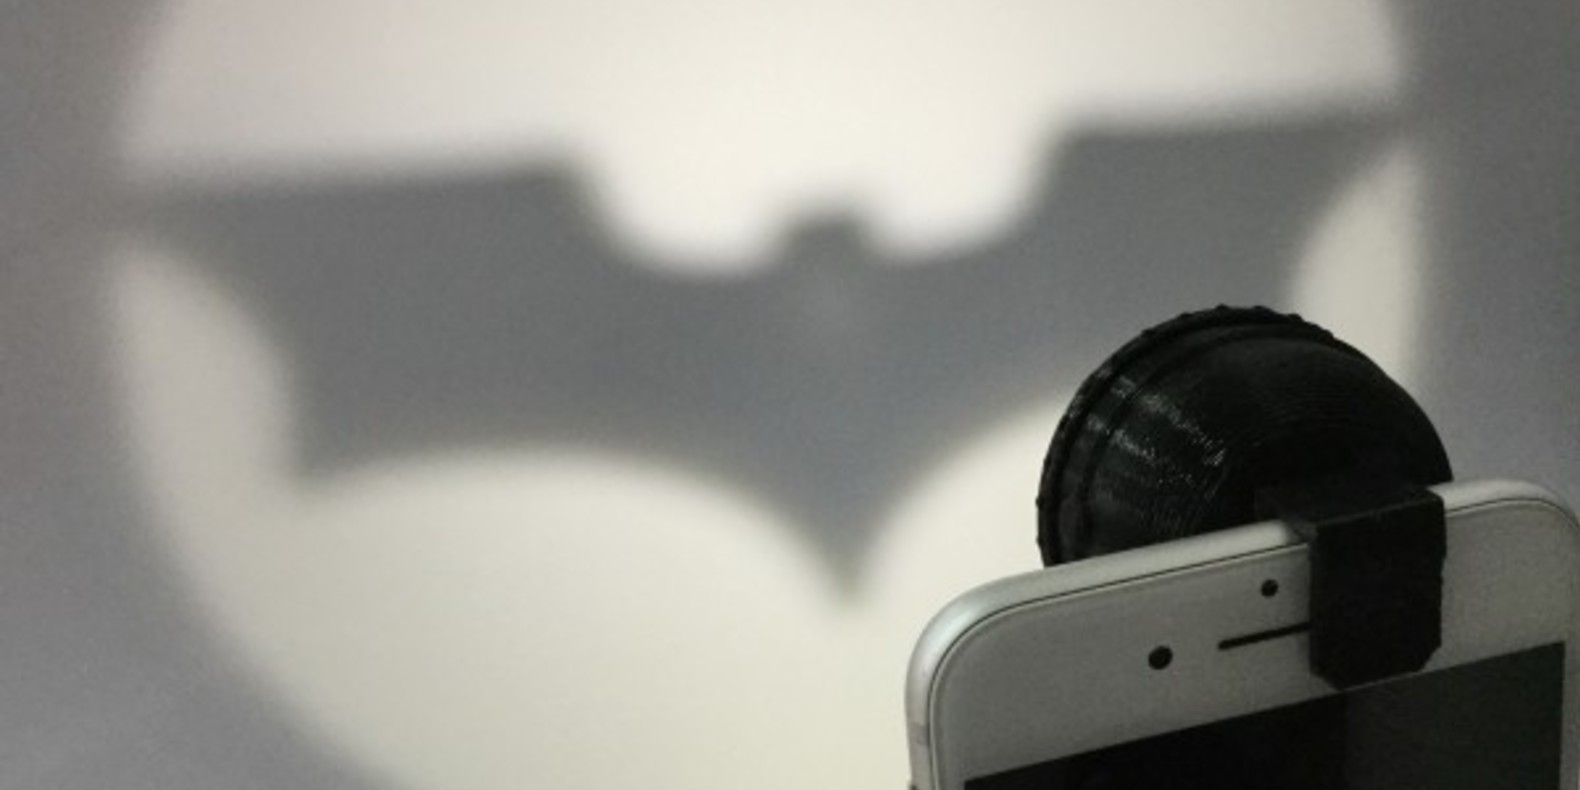 Bat-signal-fichier-3D-stl-cults-3DNG-iphone-1.jpg